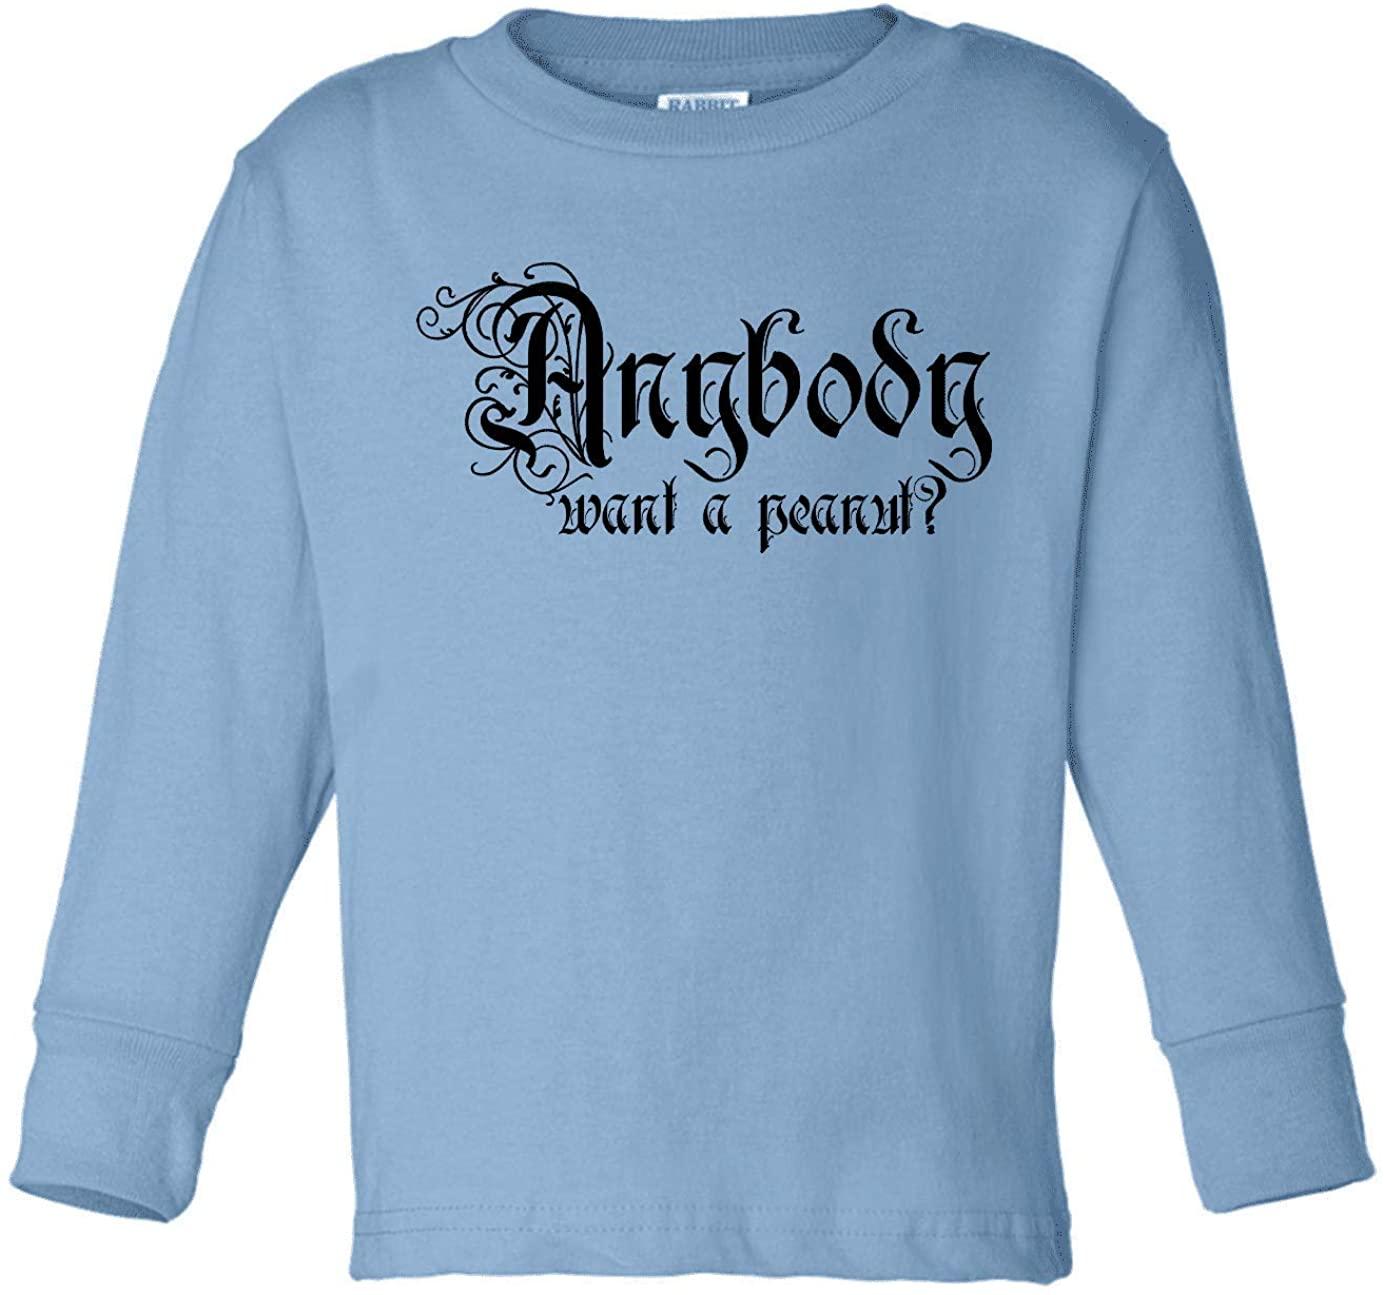 HARD EDGE DESIGN Toddler's Anybody Want a Peanut Long Sleeve T-Shirt, 4T, Light Blue